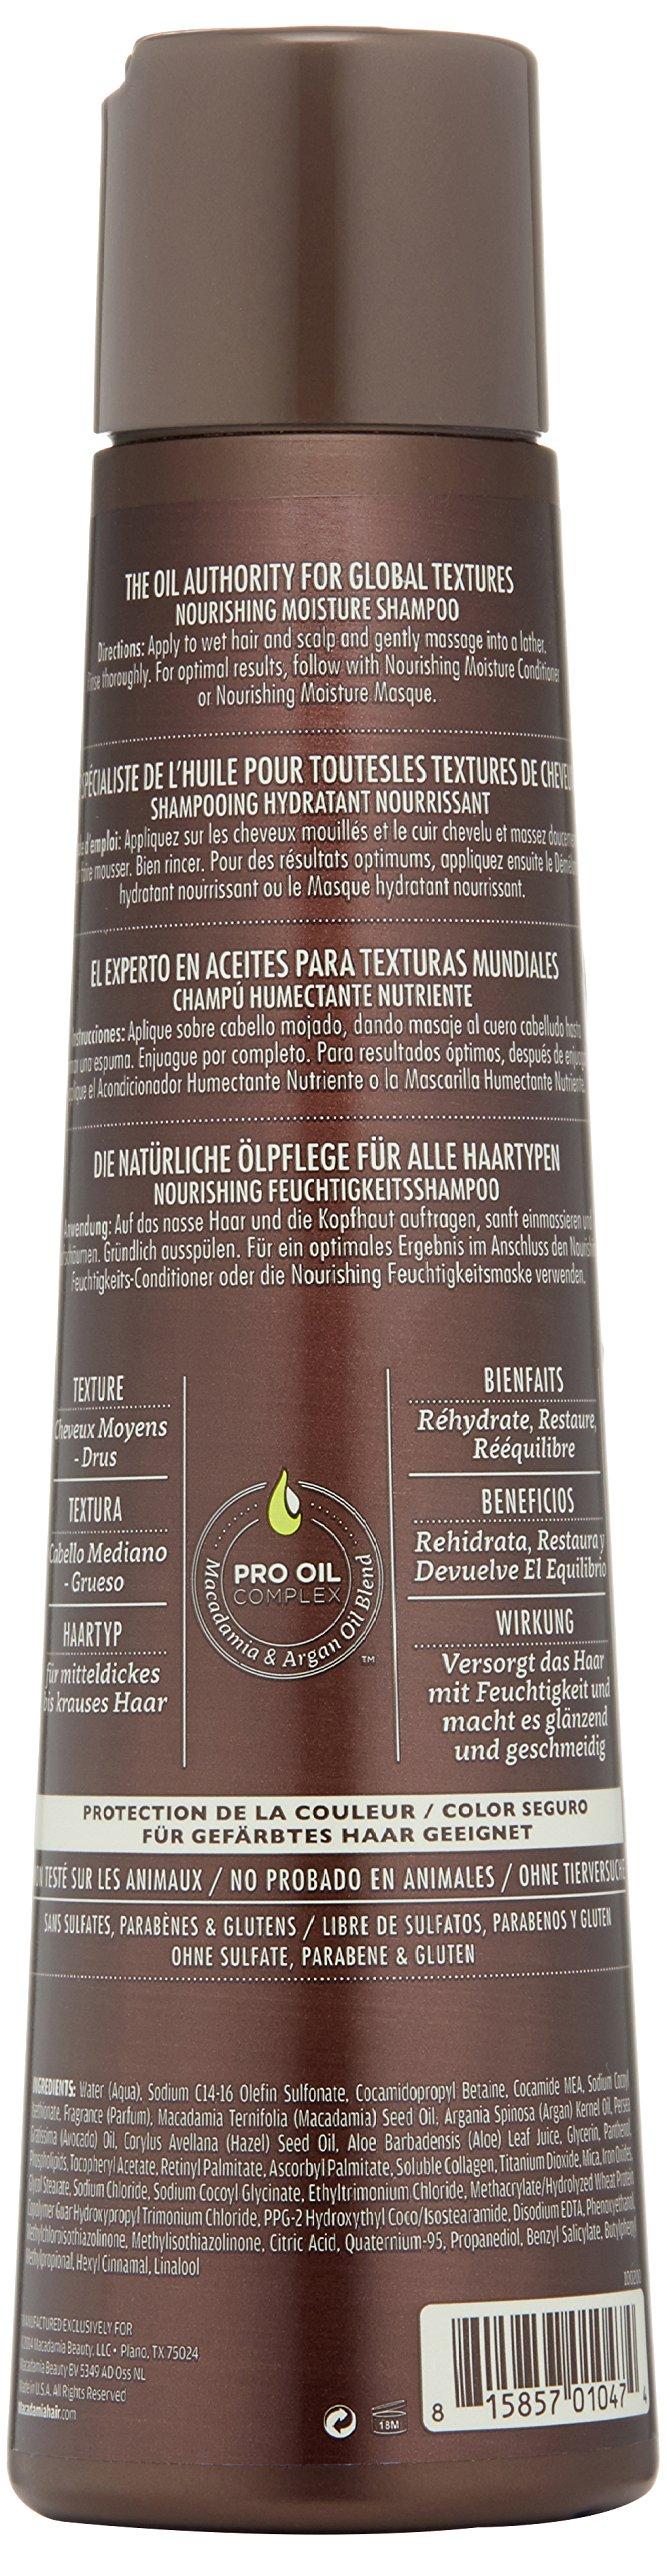 Macadamia Professional Nourishing Moisture Shampoo - 10oz. - Medium to Coarse Hair Textures - Moisturizes & Strengthens - With Argan Oil - Sulfate, Gluten & Paraben Free, Safe for Color-Treated Hair